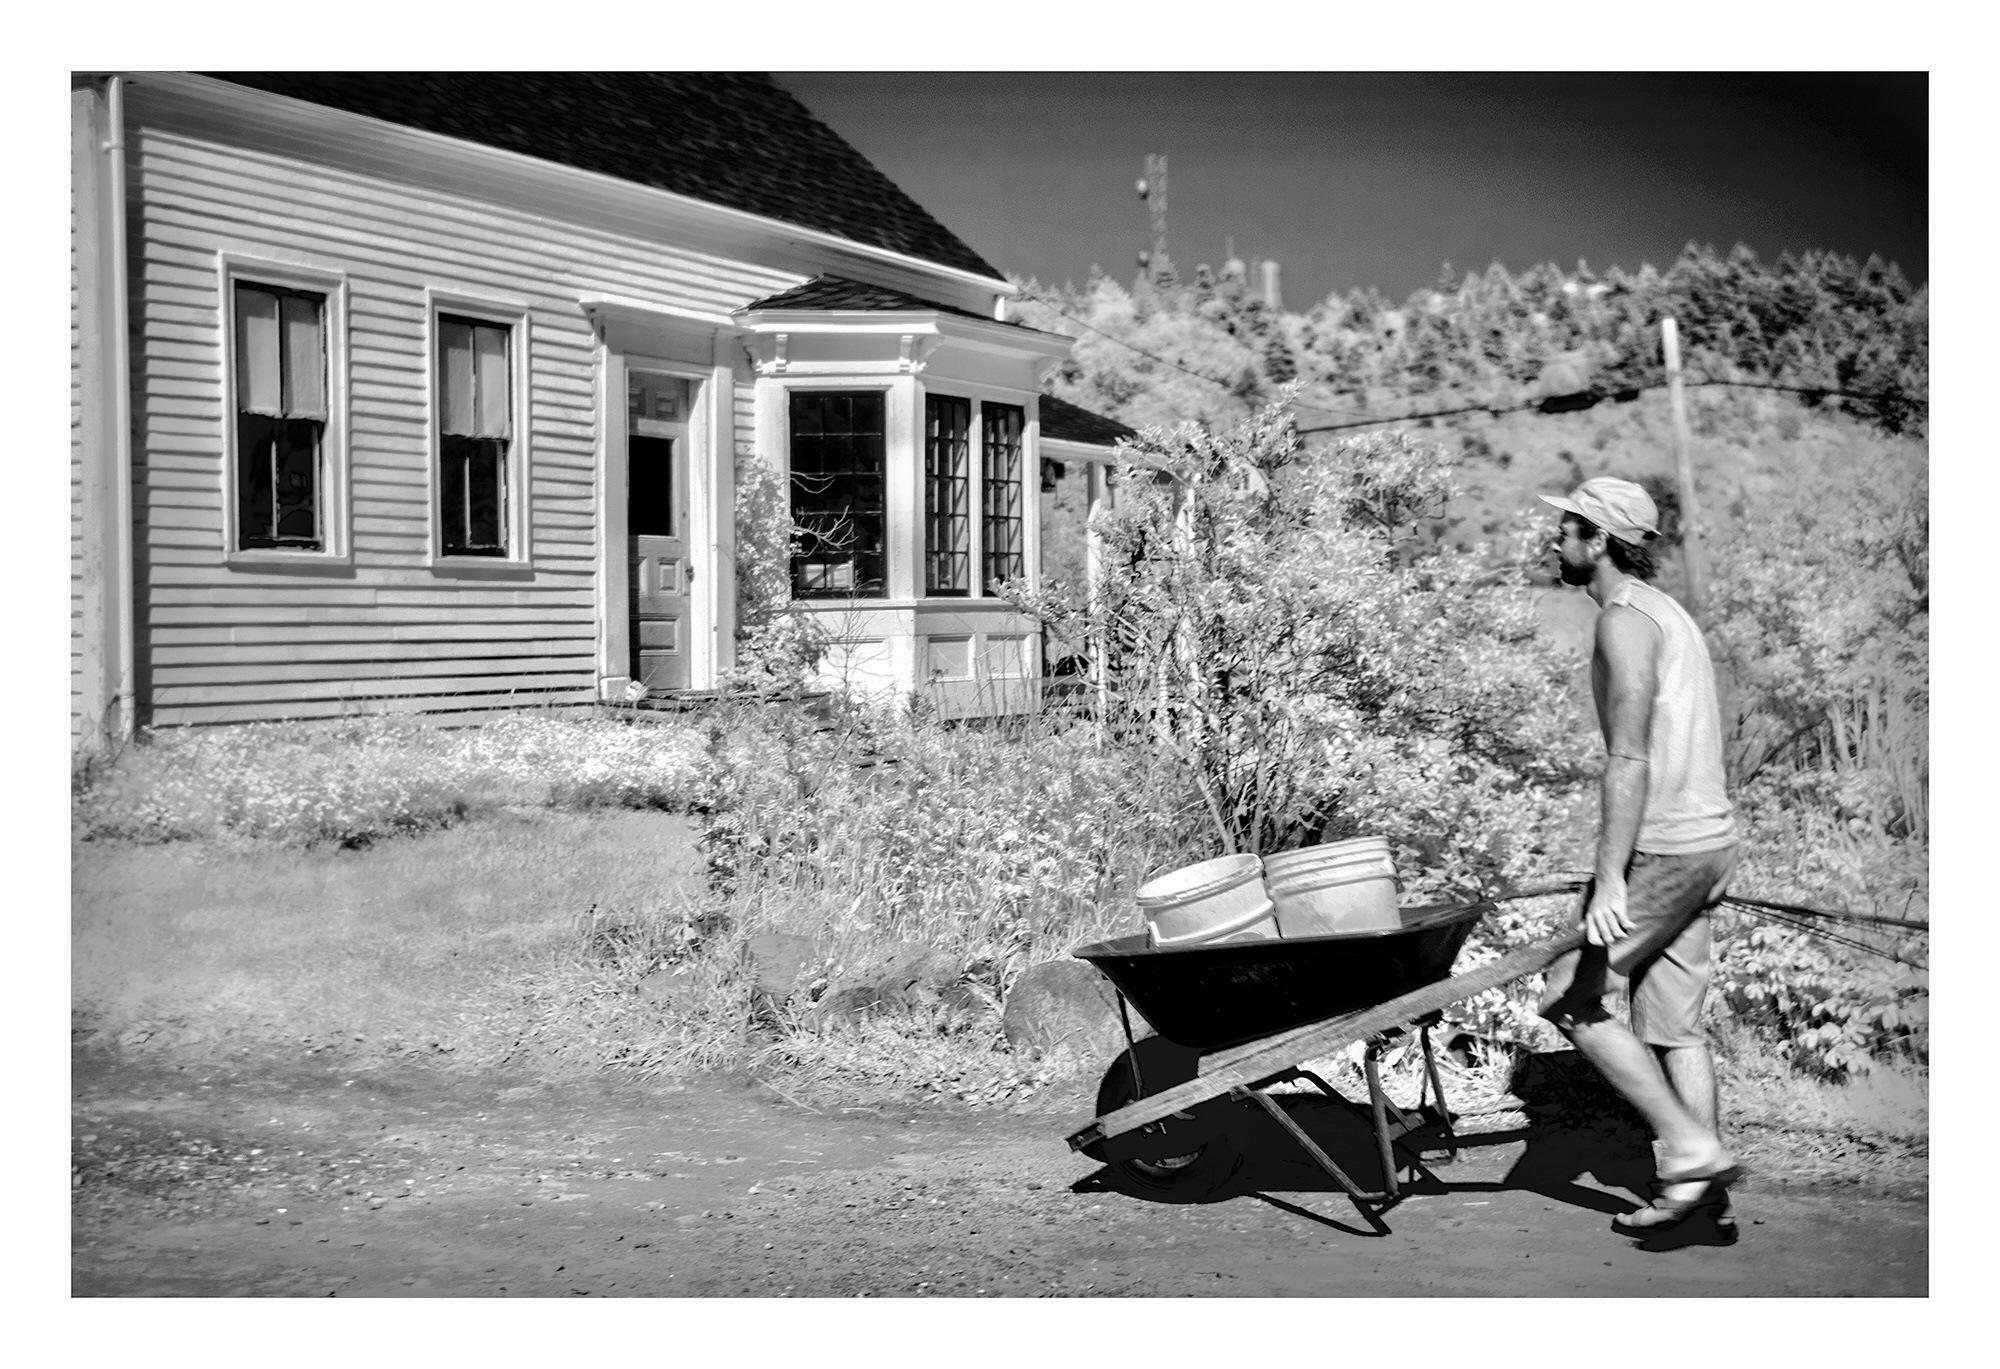 Wheel Barrow, Main Street, Monhegan Island, Maine. Infrared. by Carol-Lynn Rössel